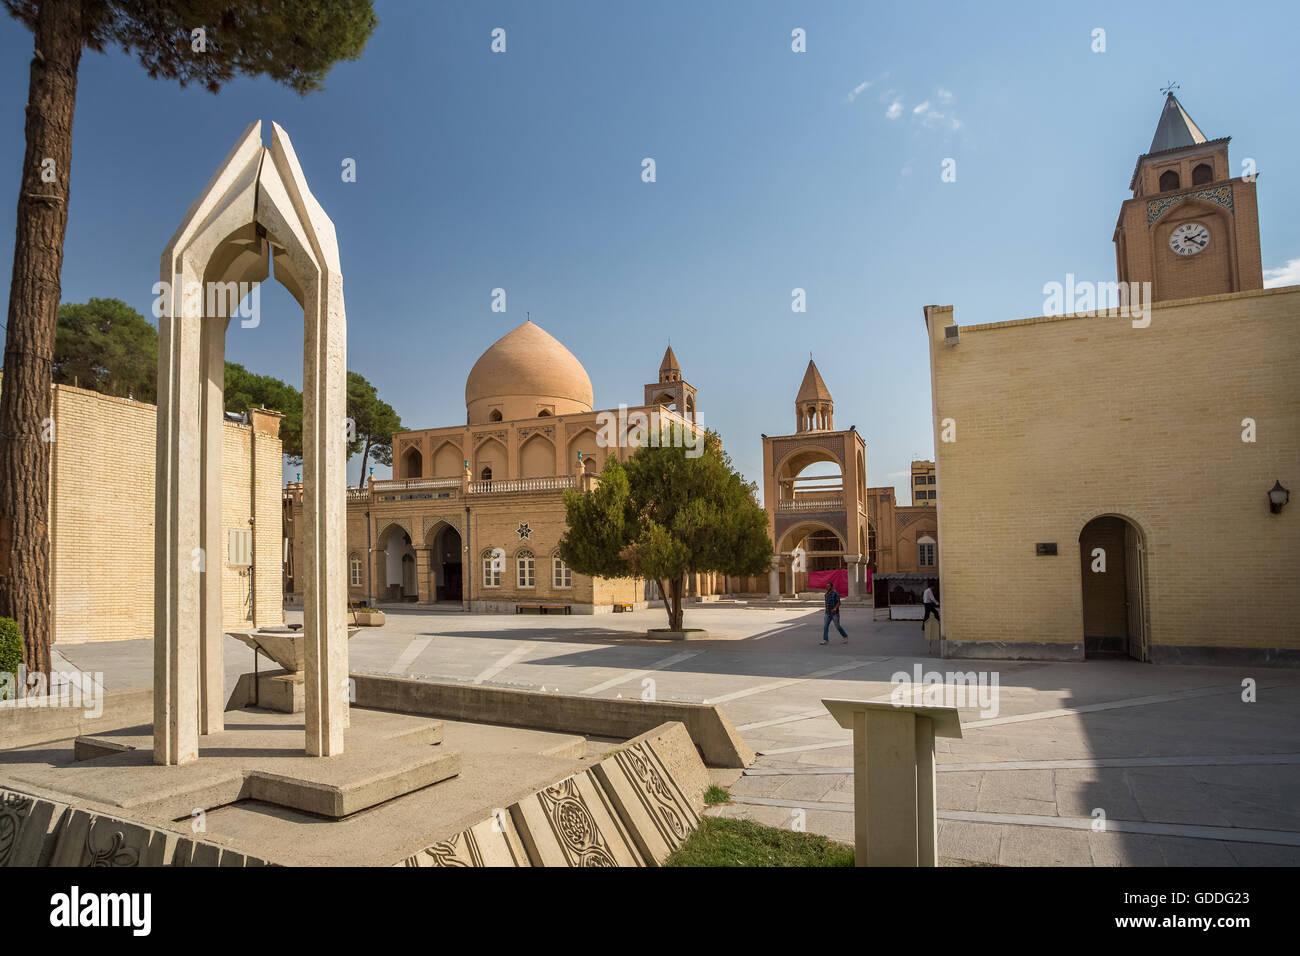 Iran,Esfahan City,Jolfa,Armenian Quarter,Vank Cathedral, - Stock Image